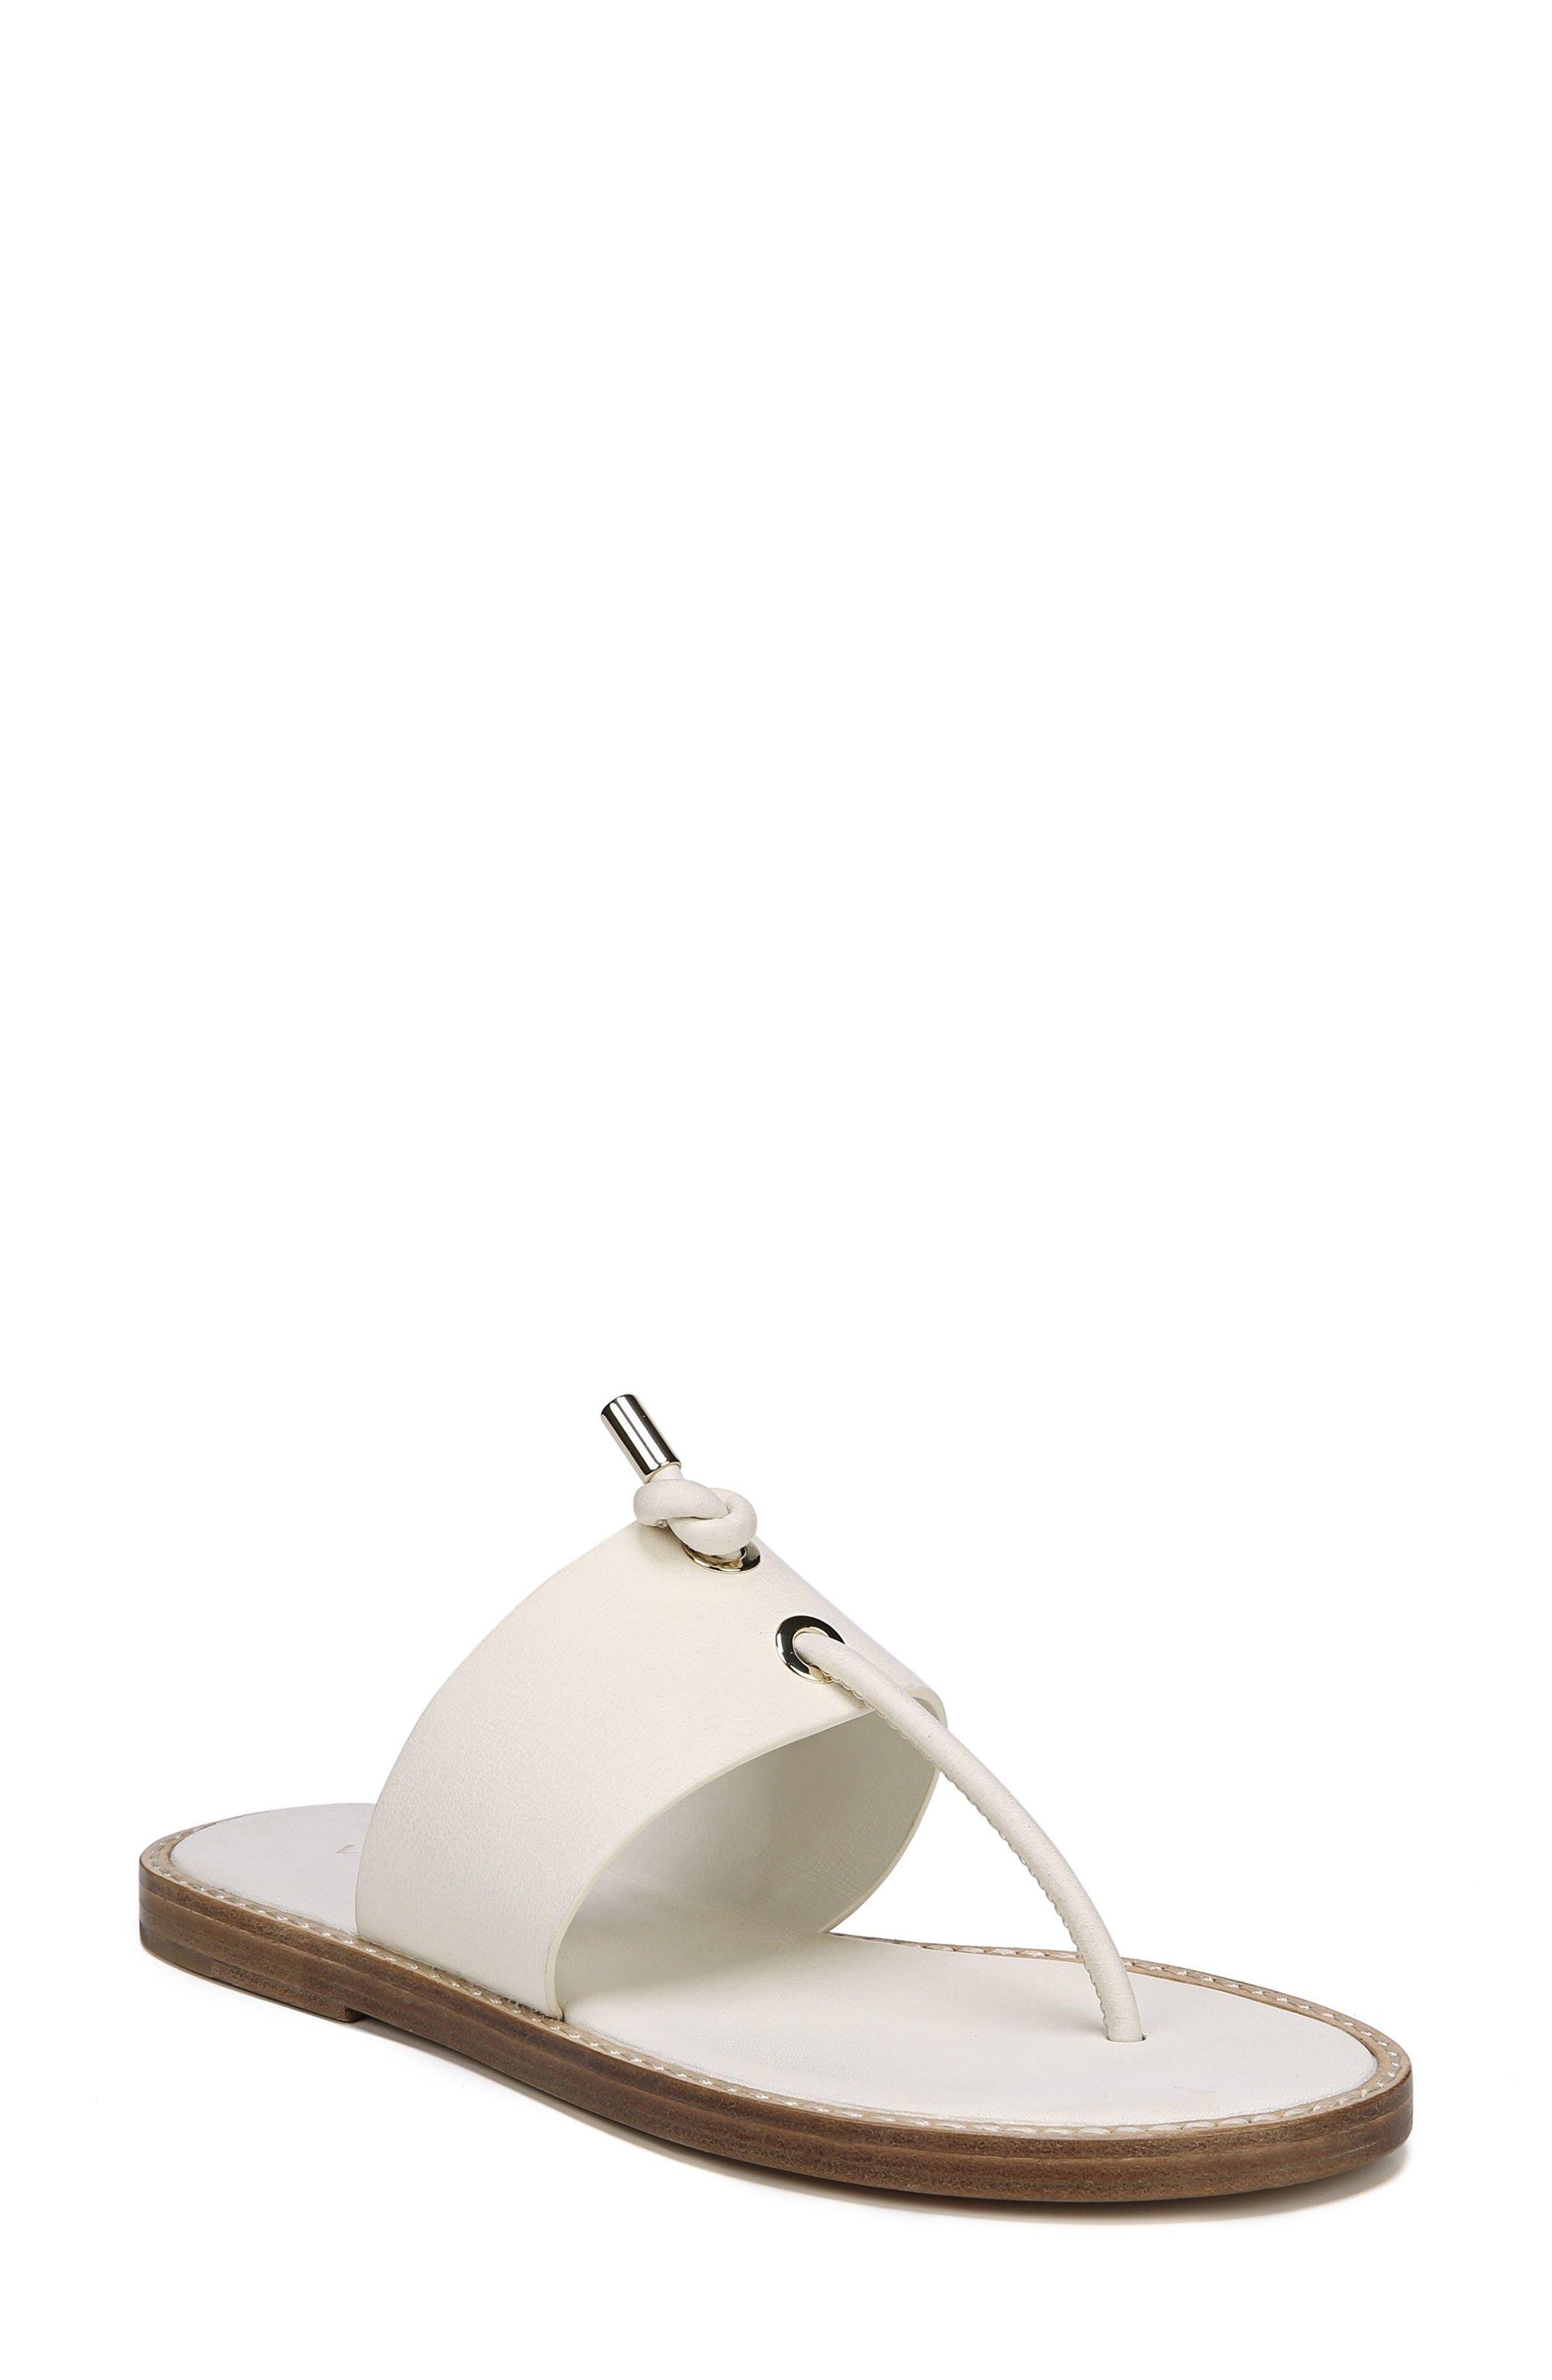 Caelan Sandal,                         Main,                         color, OFF WHITE